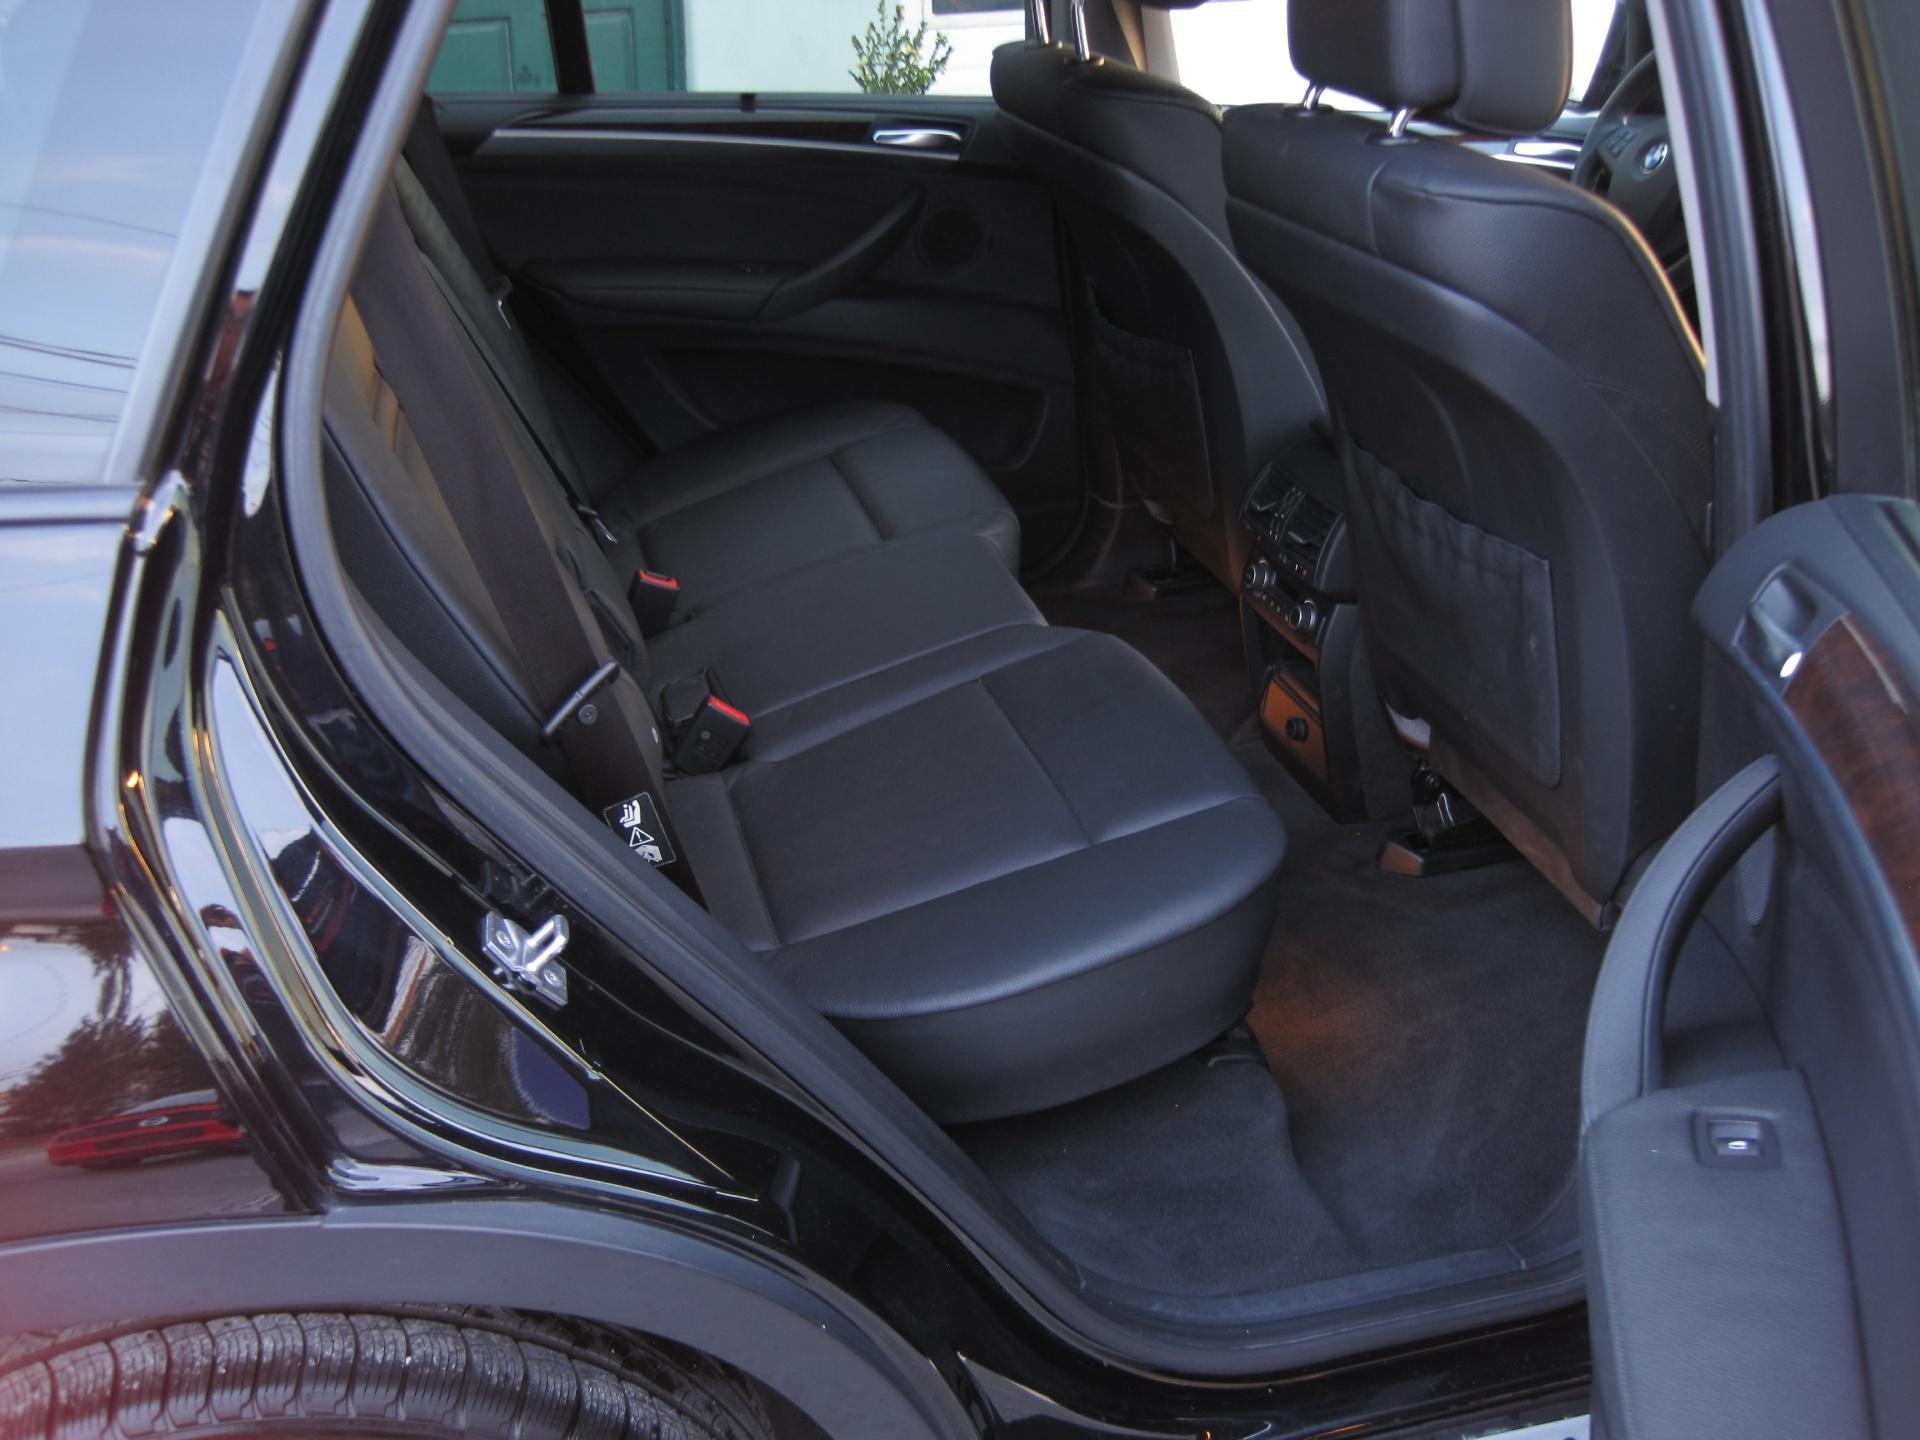 2011 BMW X5 xDrive35d DIESEL 3RD ROW SEAT PREMIUM